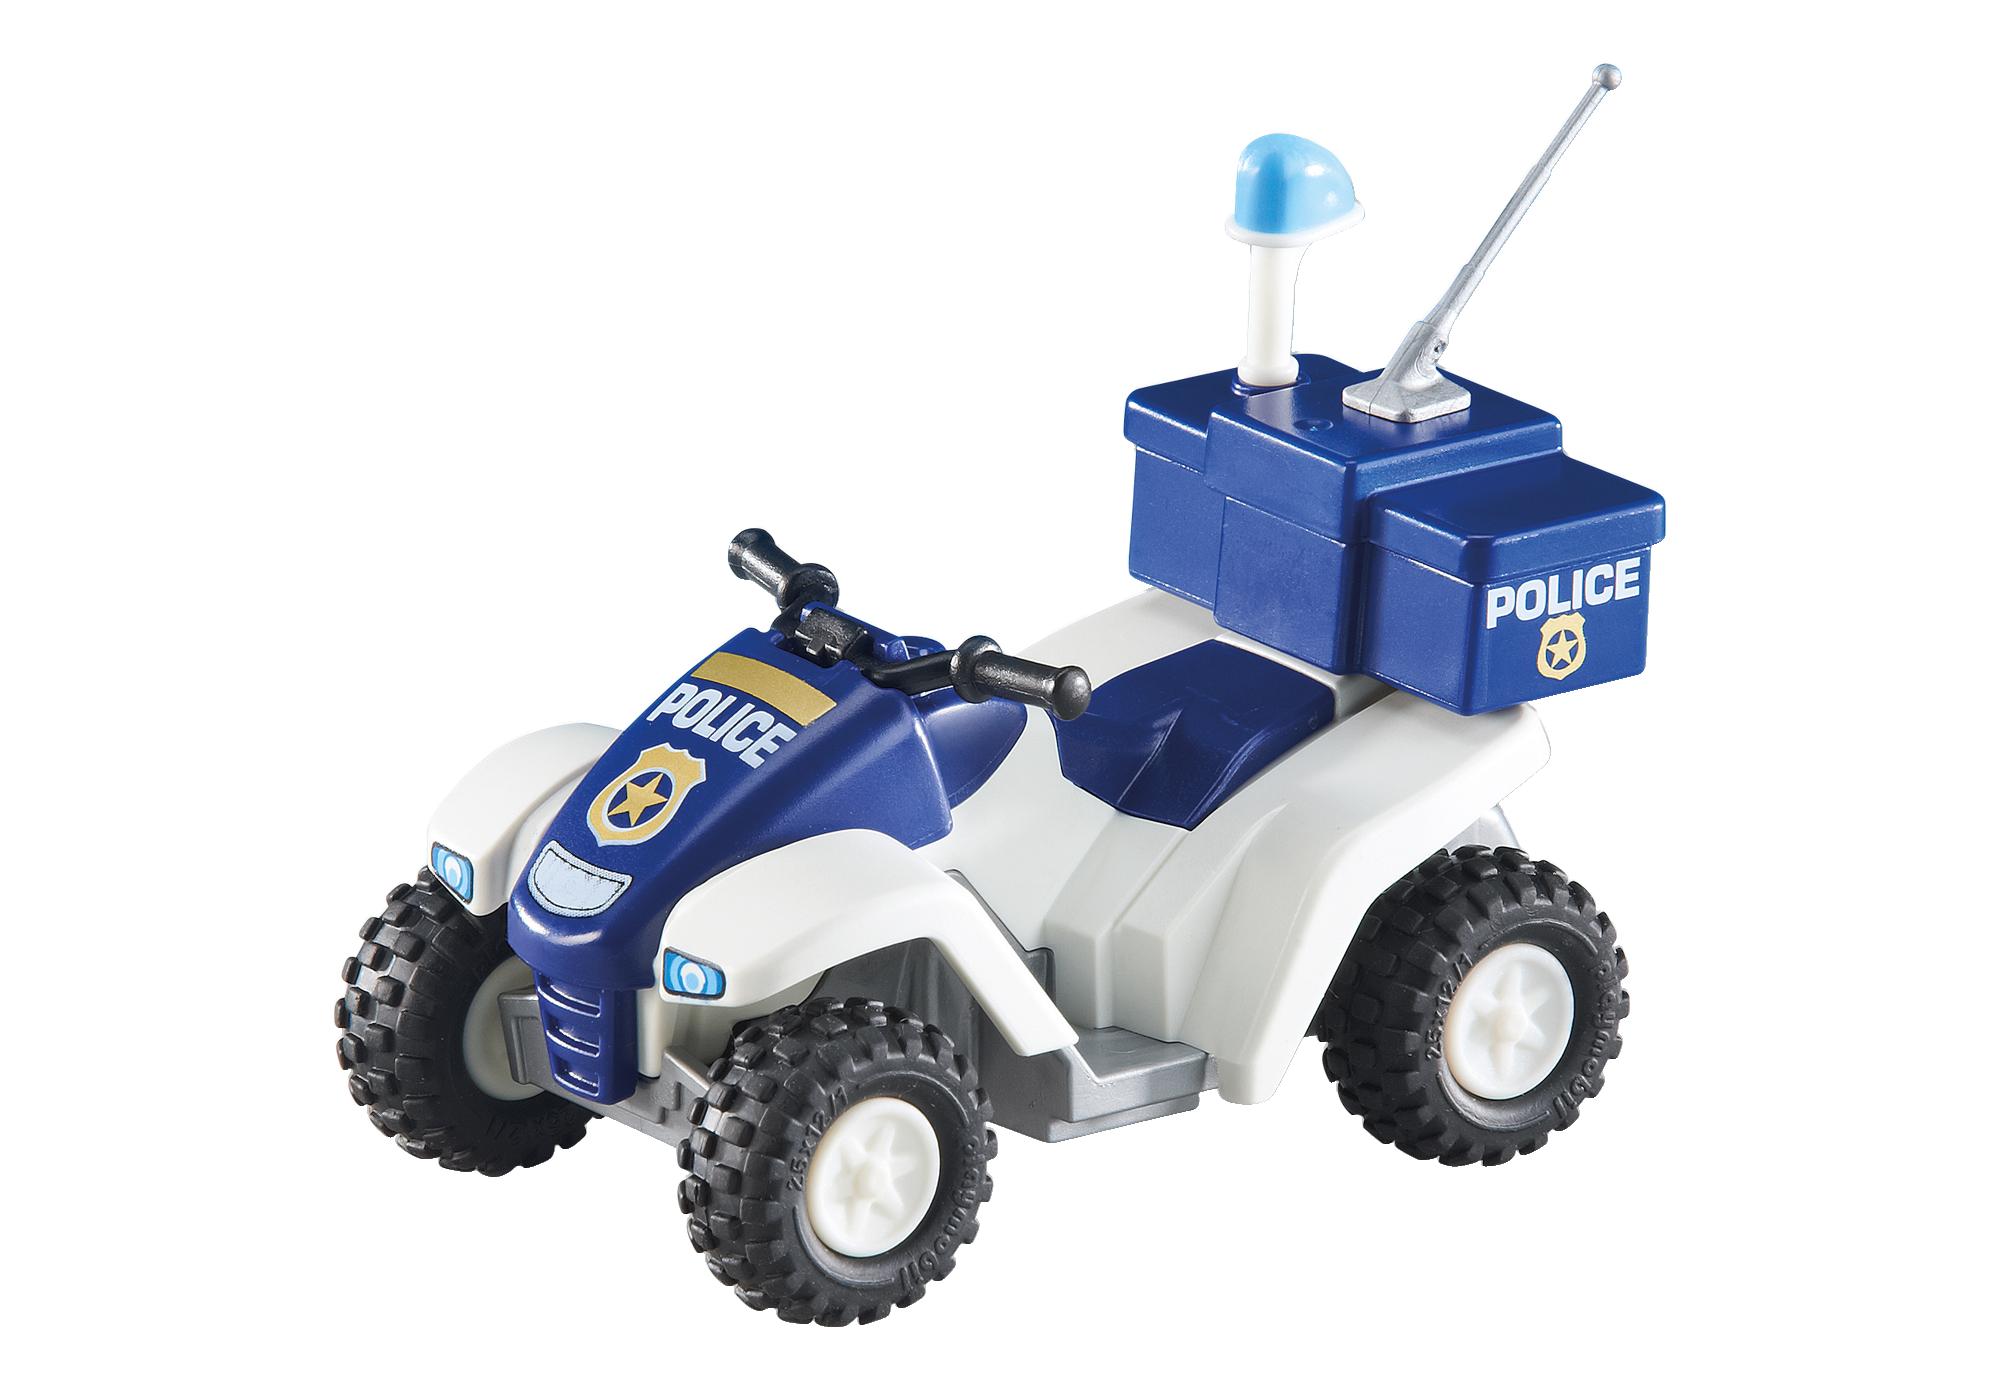 http://media.playmobil.com/i/playmobil/6504_product_box_front/Police Quad Bike